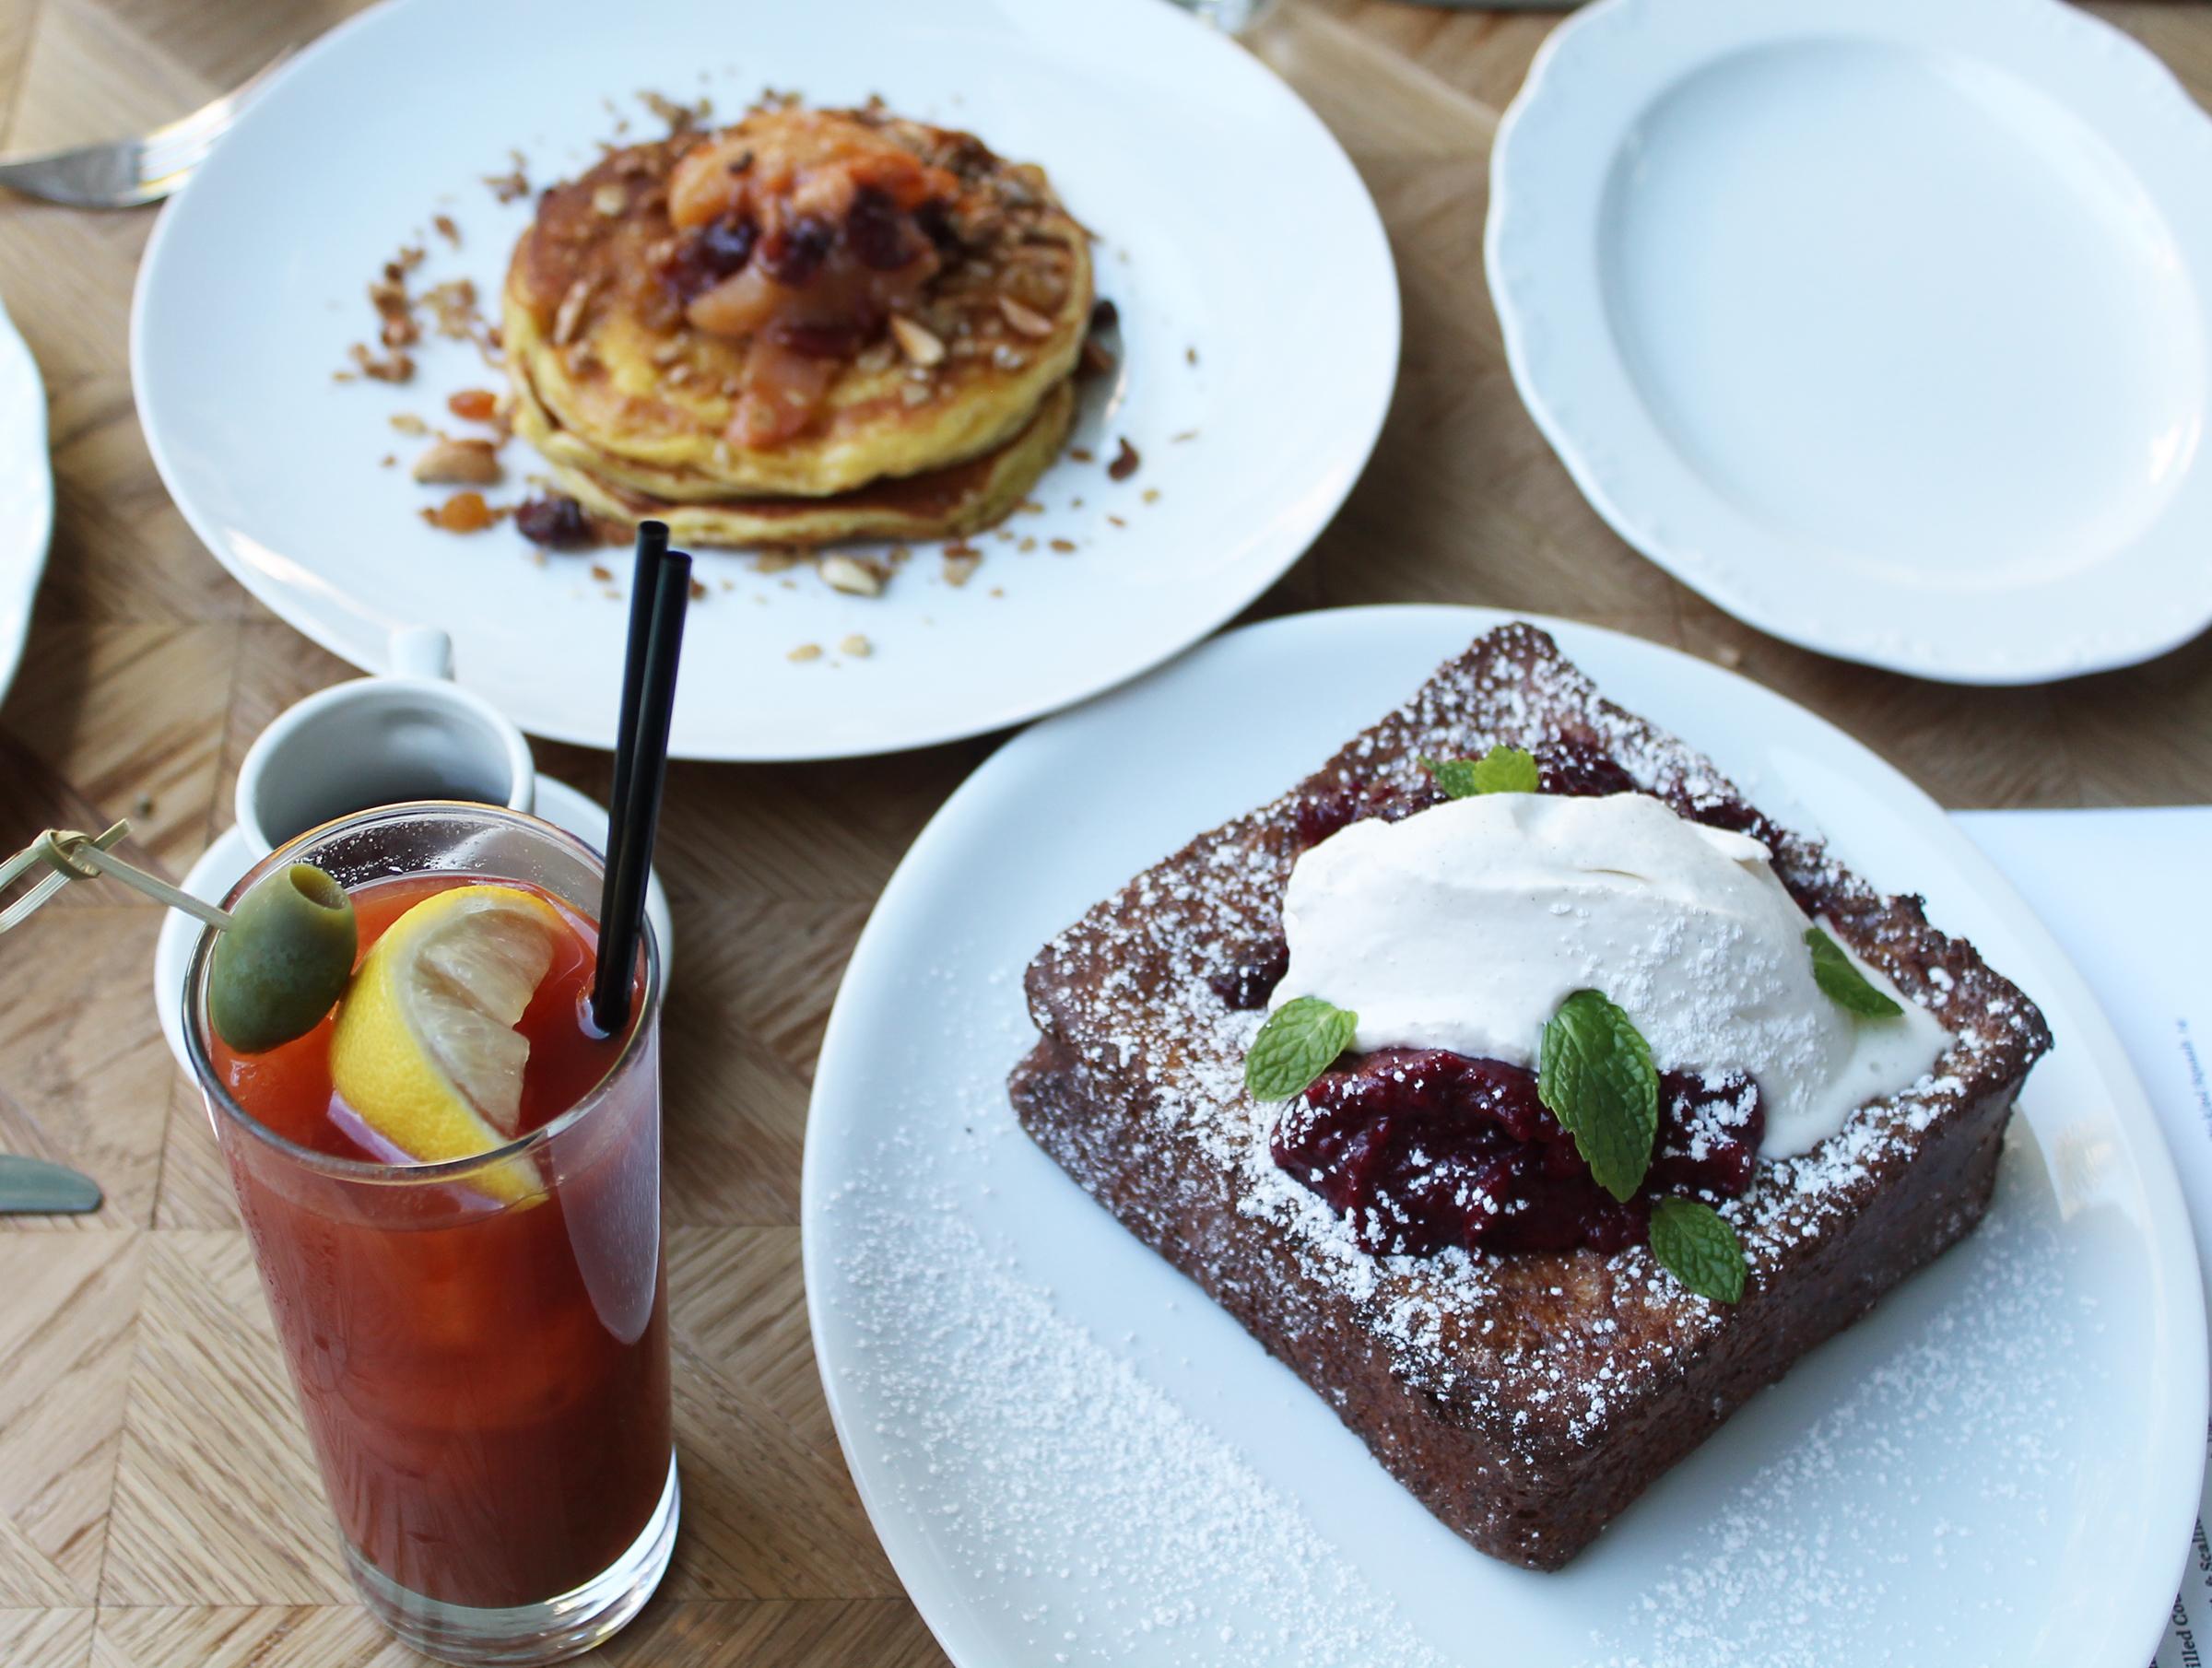 BRIOCHE FRENCH TOAST: Chocolate Ganache Filling, Fruit Compote